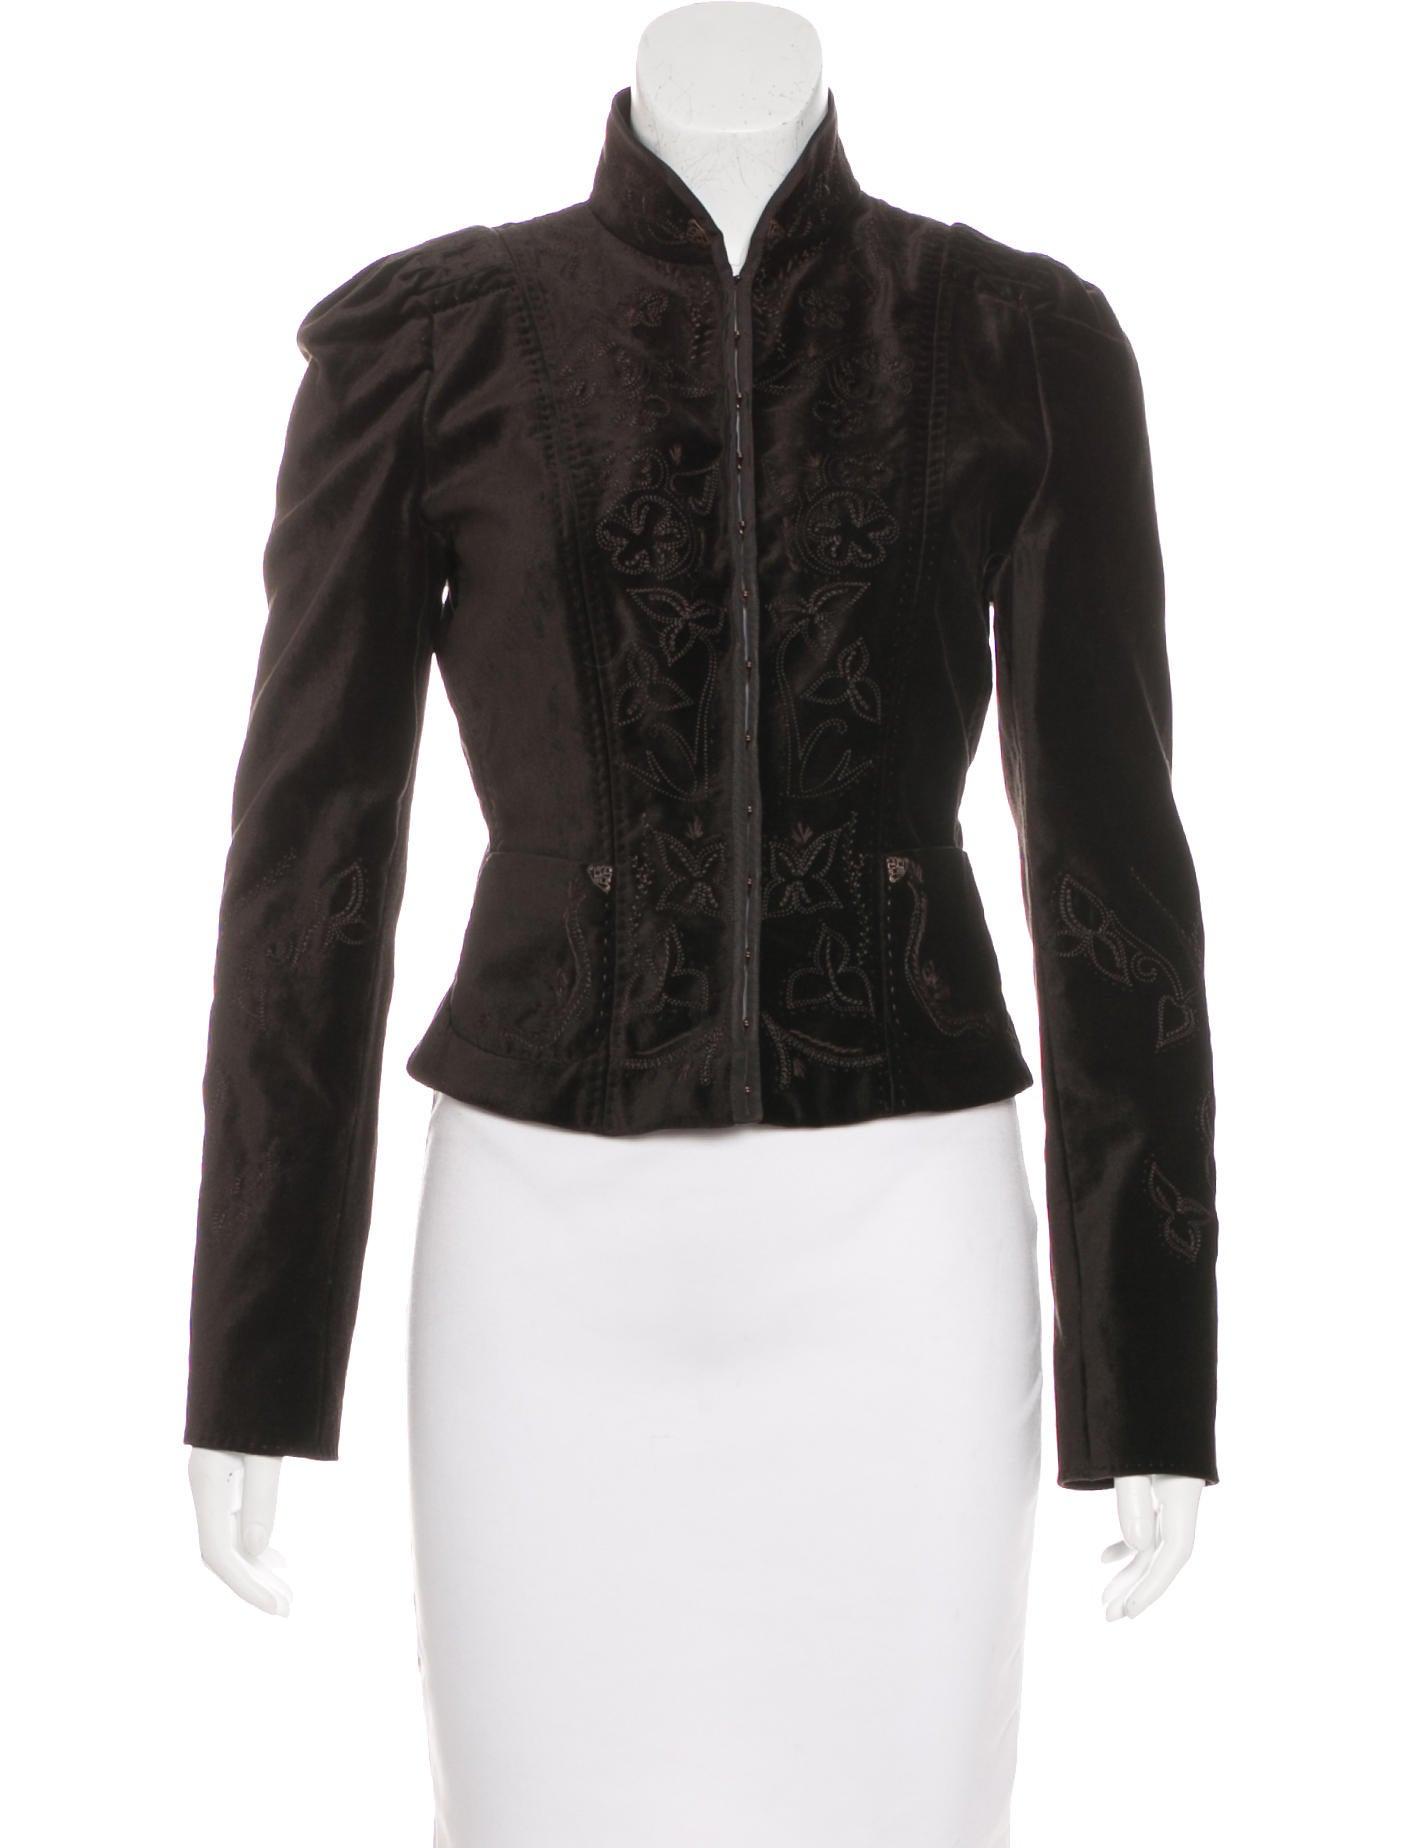 Elie tahari velvet embroidered jacket clothing